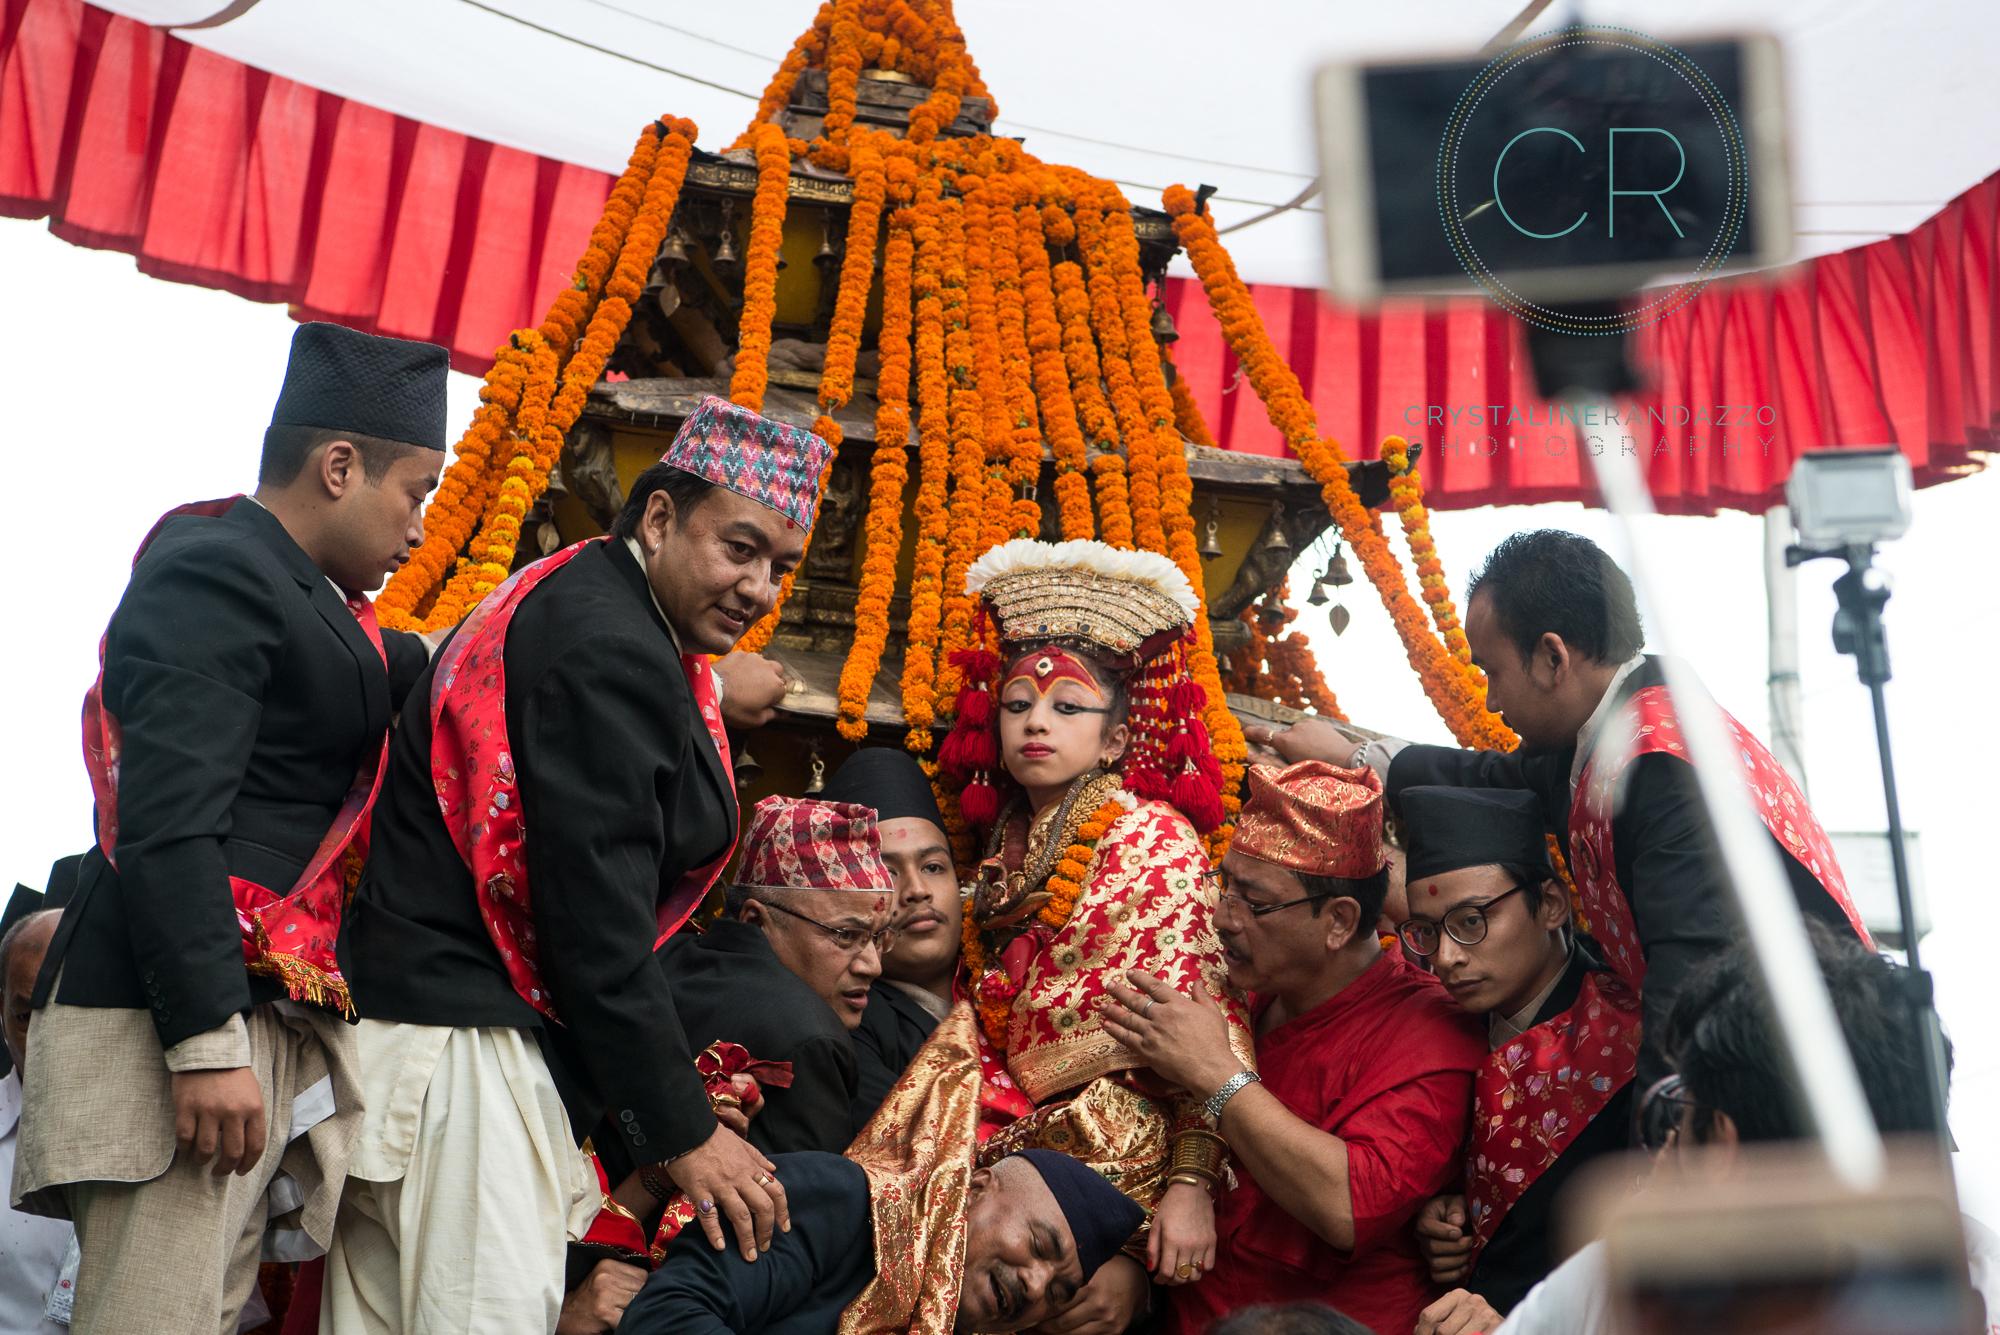 Randazzo_Kathmanduwanderings_20170905_00292.jpg